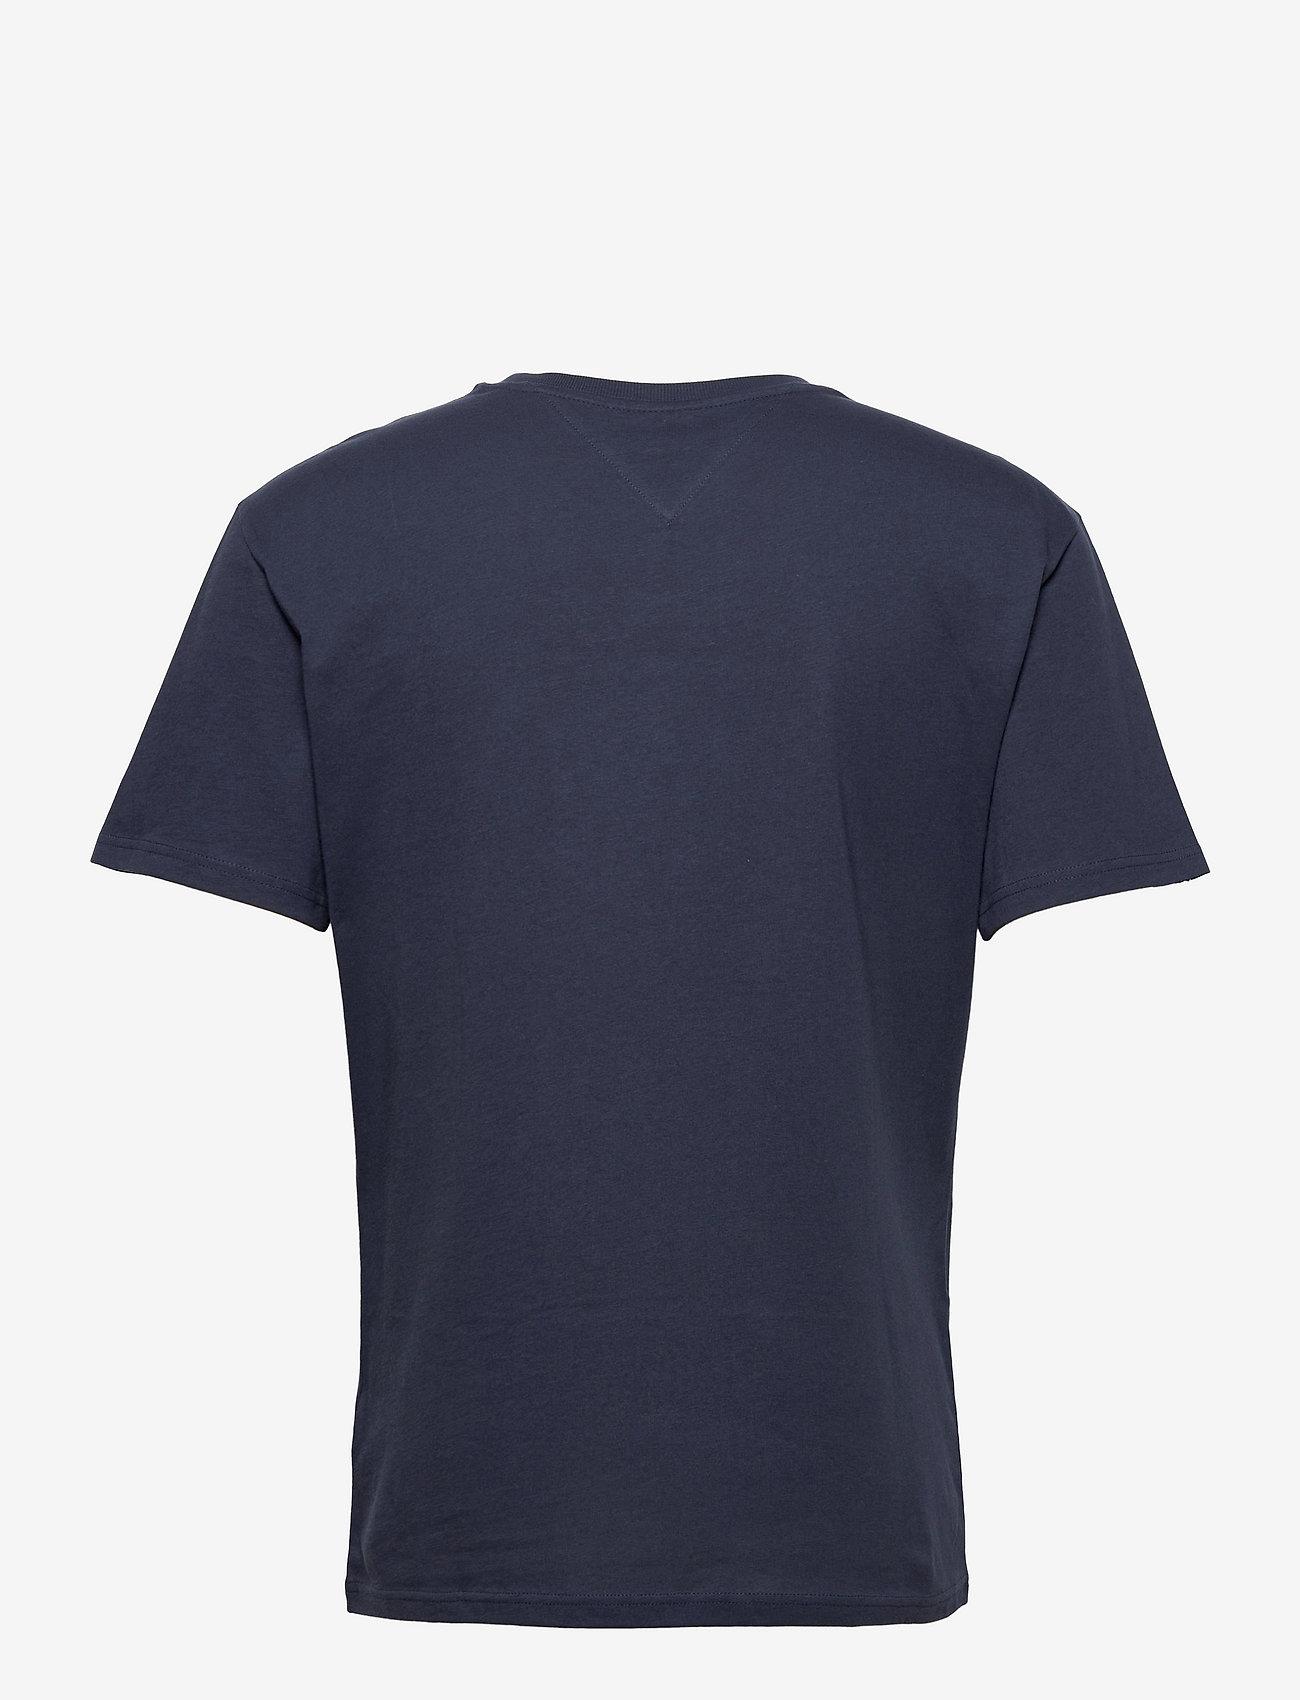 Tommy Jeans - TJM SMALL TEXT TEE - kortärmade t-shirts - twilight navy - 1